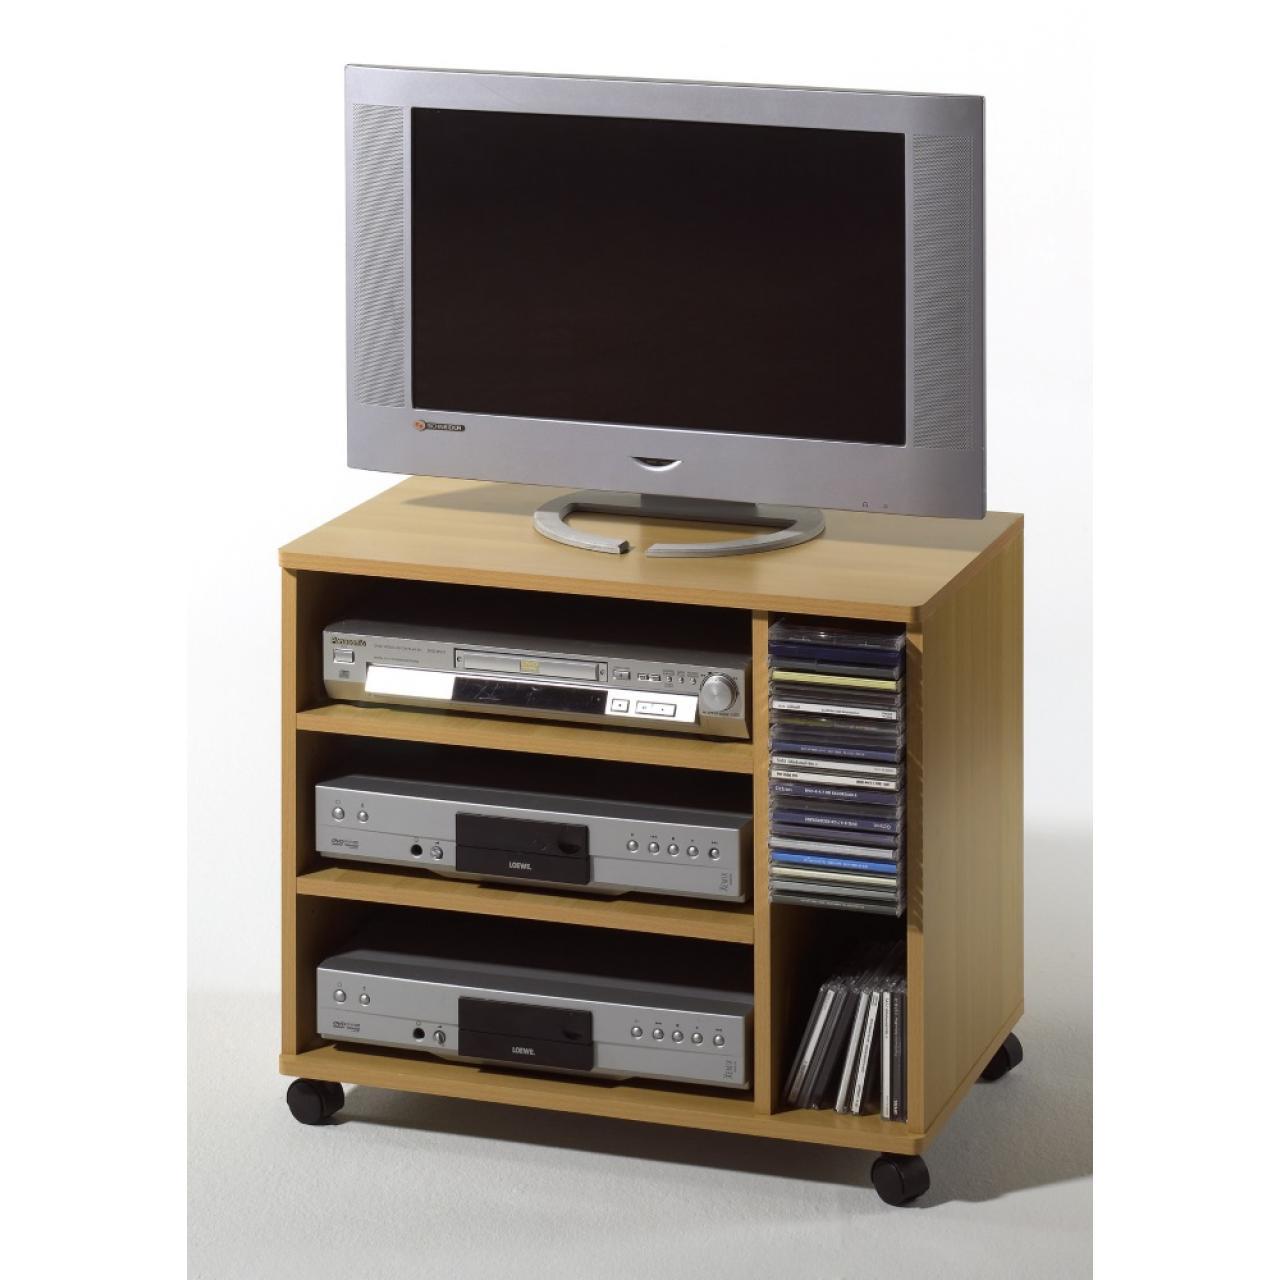 TV-Videowagen - Buche Dekor